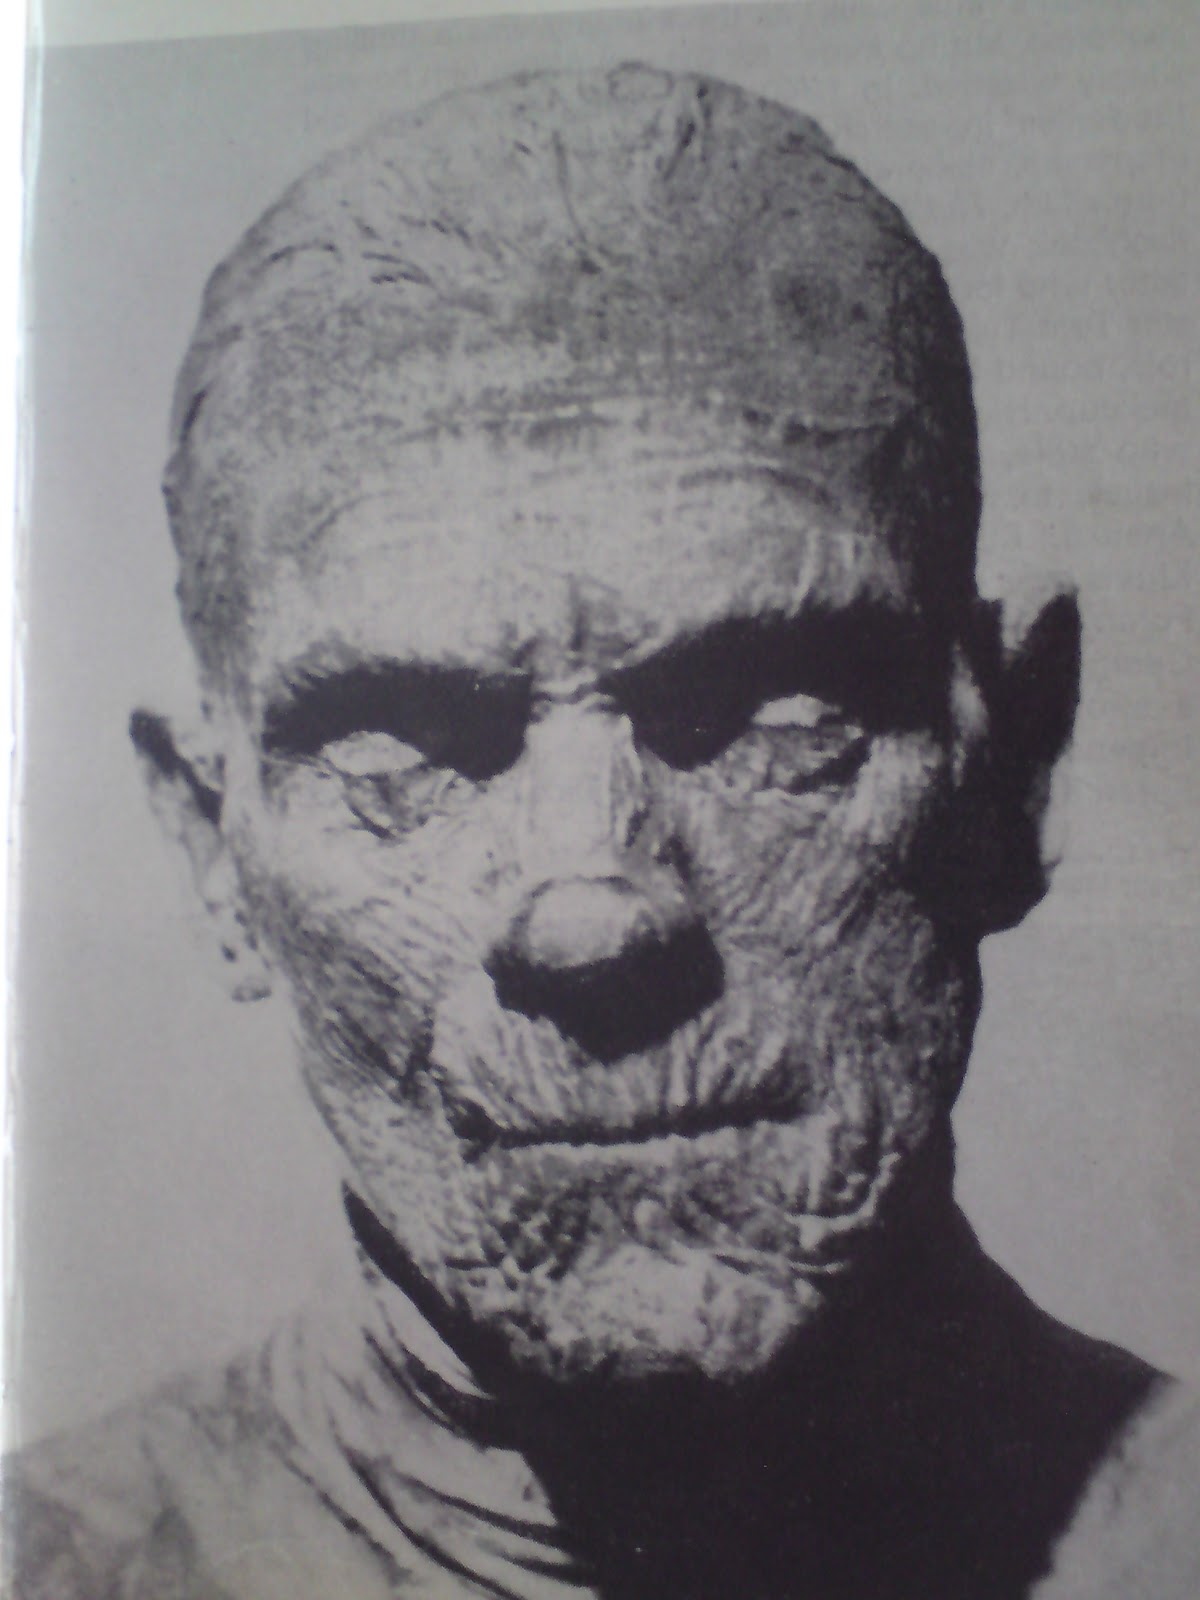 pin karloff the mummy book megaupload boris and natasha on